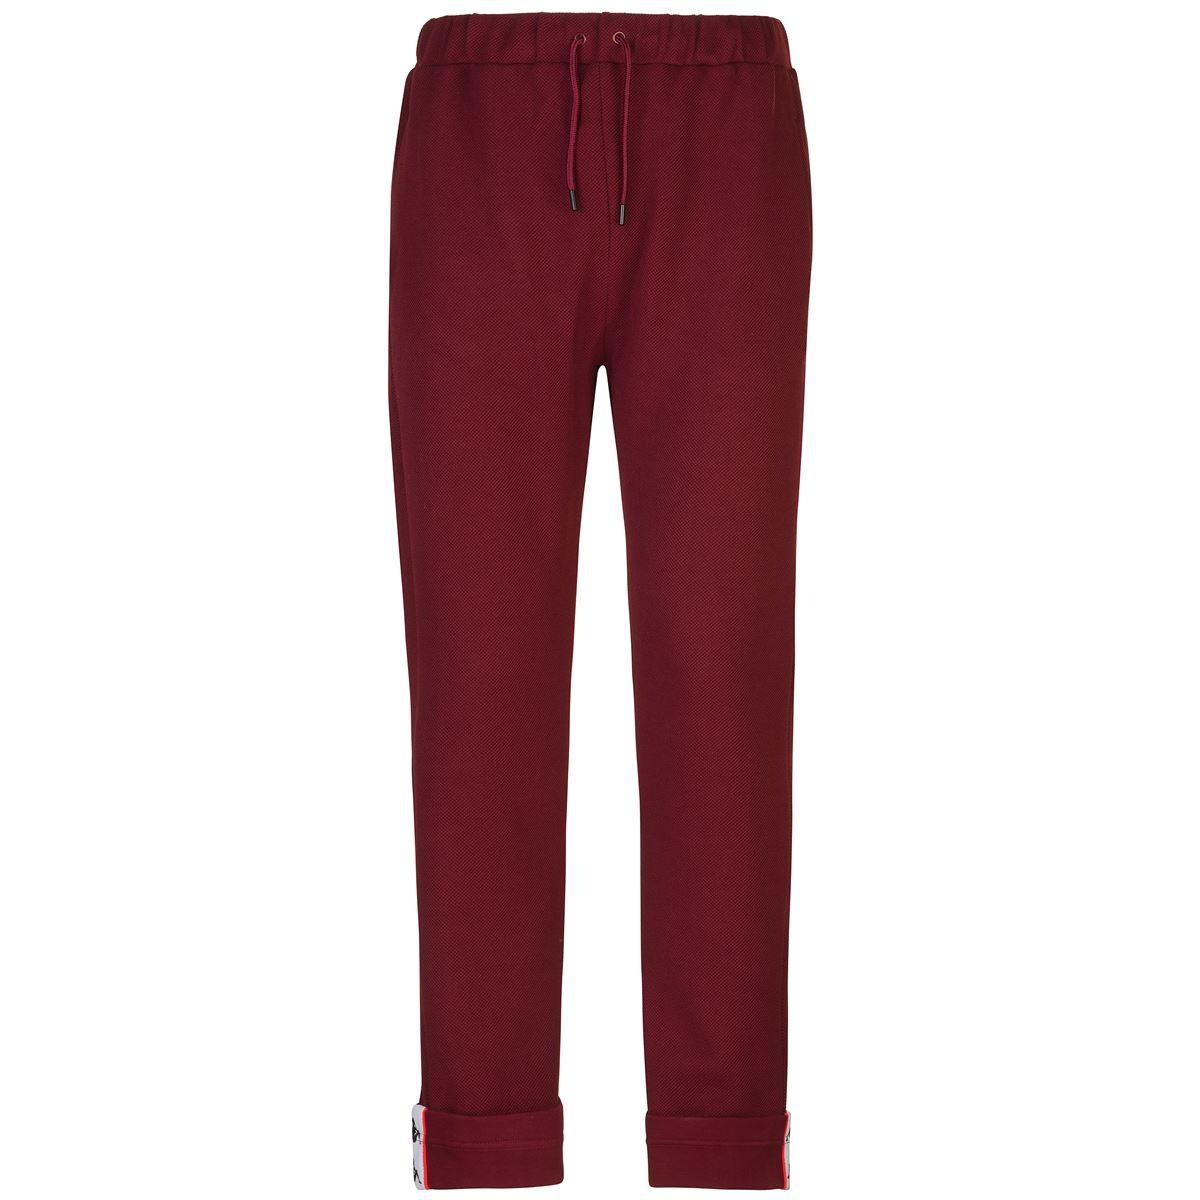 Kappa Pantaloni uomo-31118CW